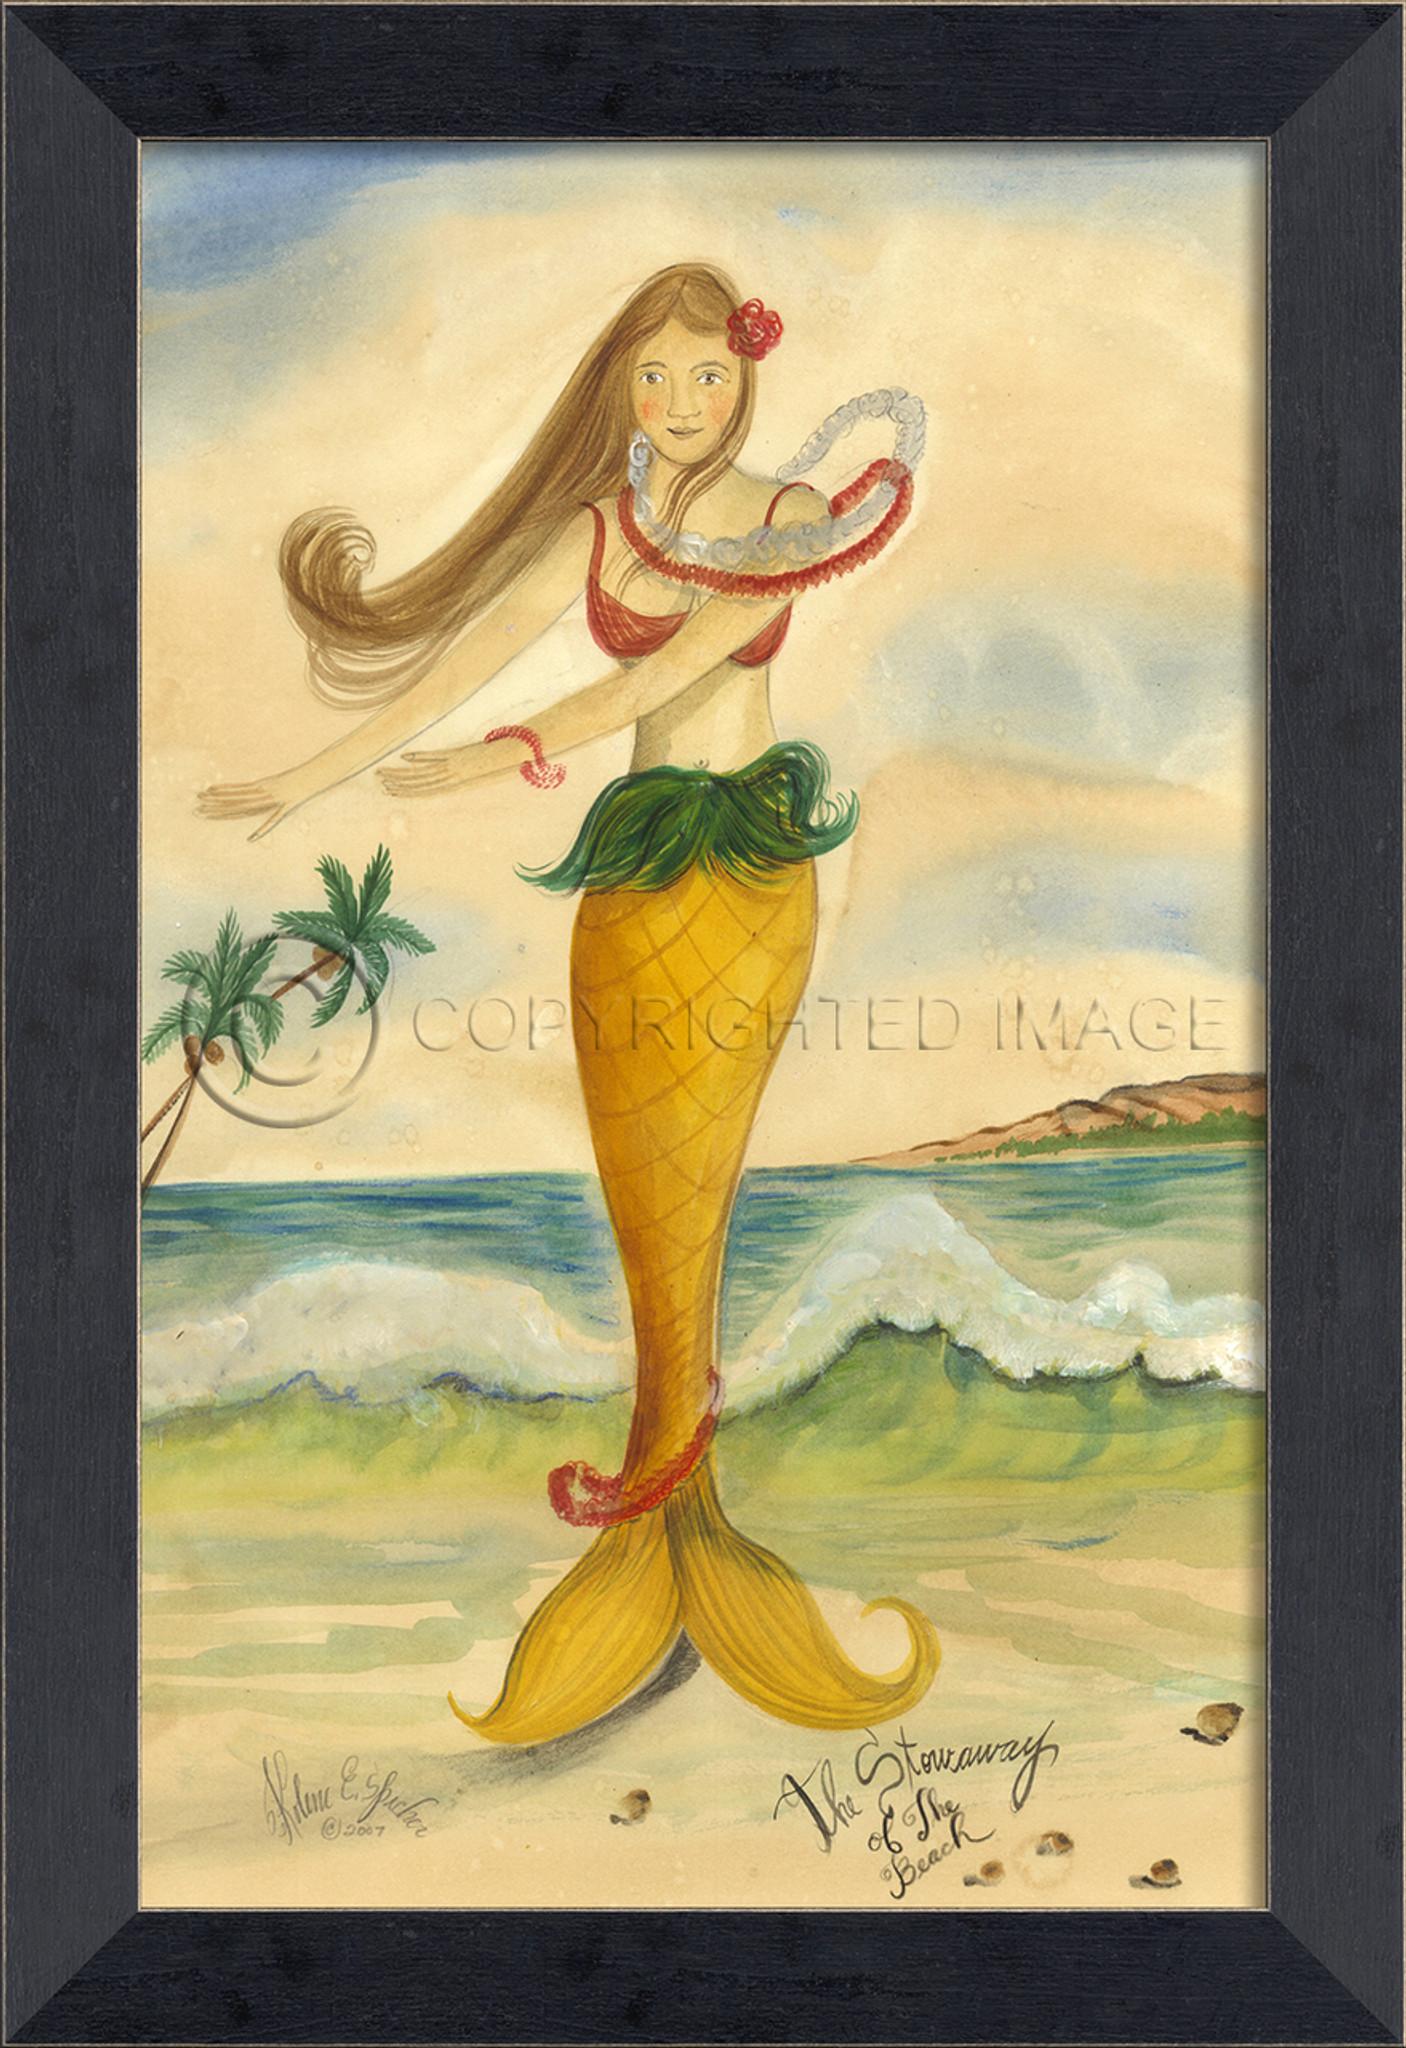 Stowaway of the Beach Mermaid Wall Art - Small